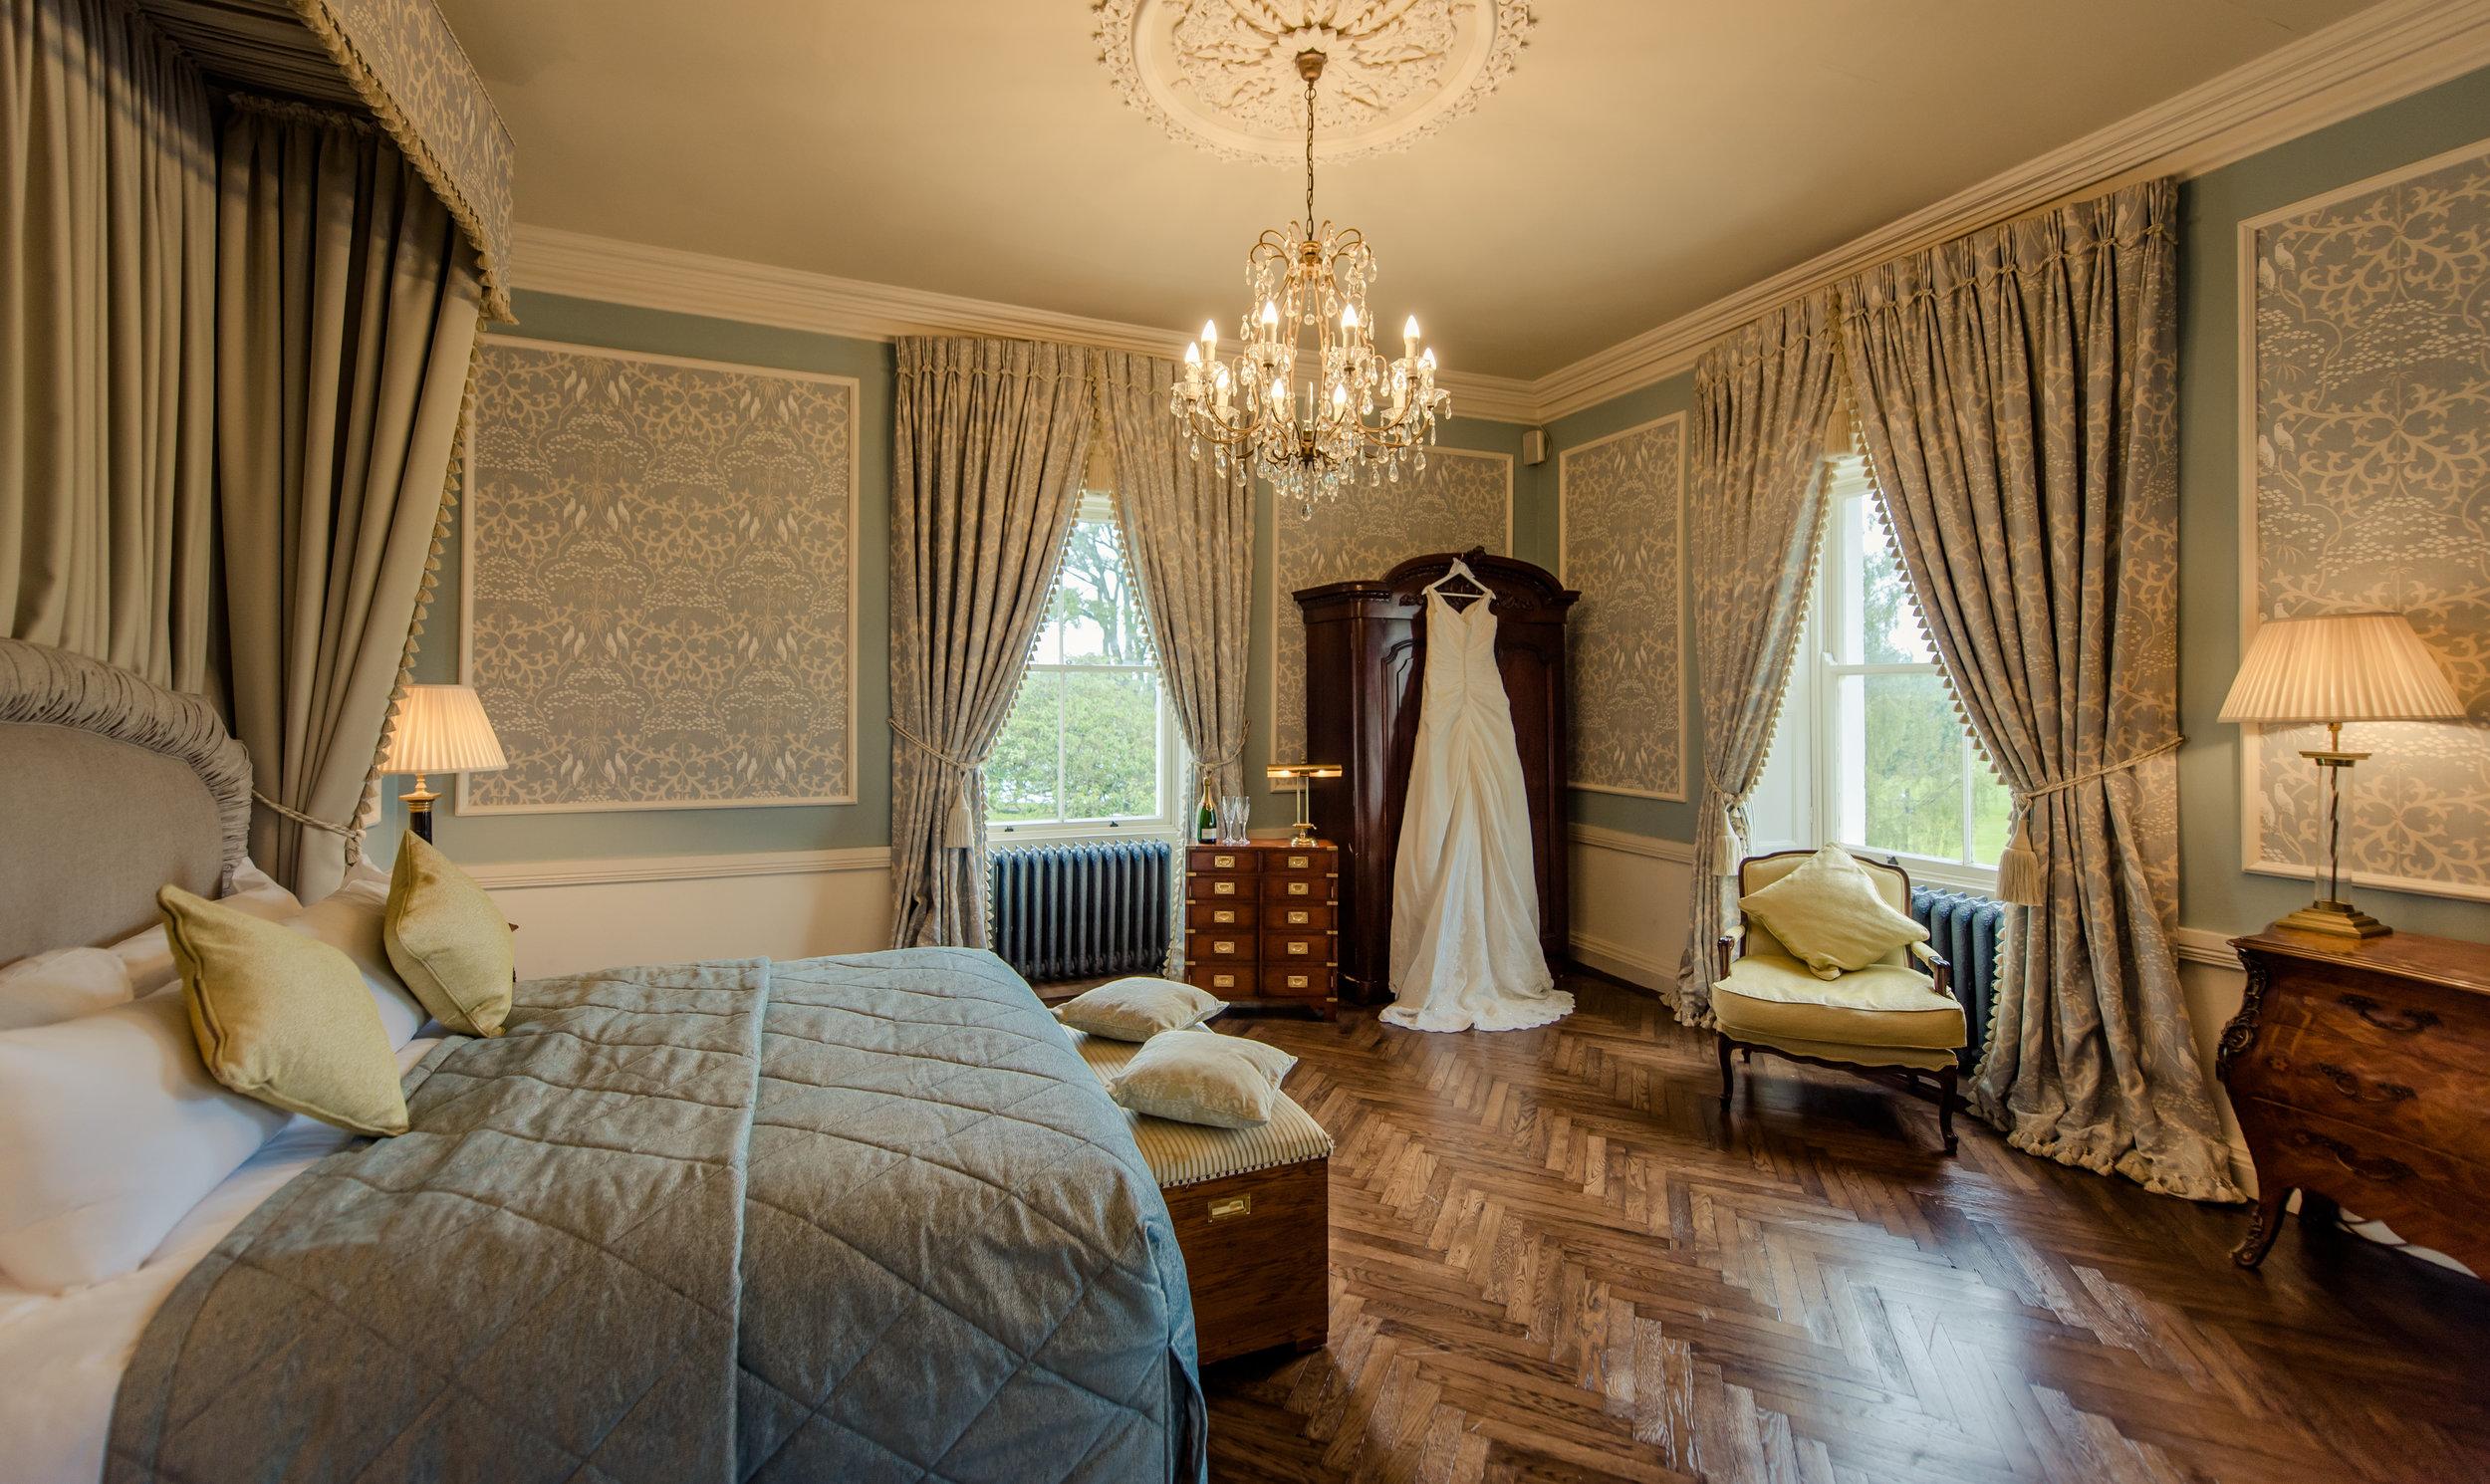 Tulfarris Hotel & Golf Resort Wych Hazel bridal suite full room view with wedding dress.jpg